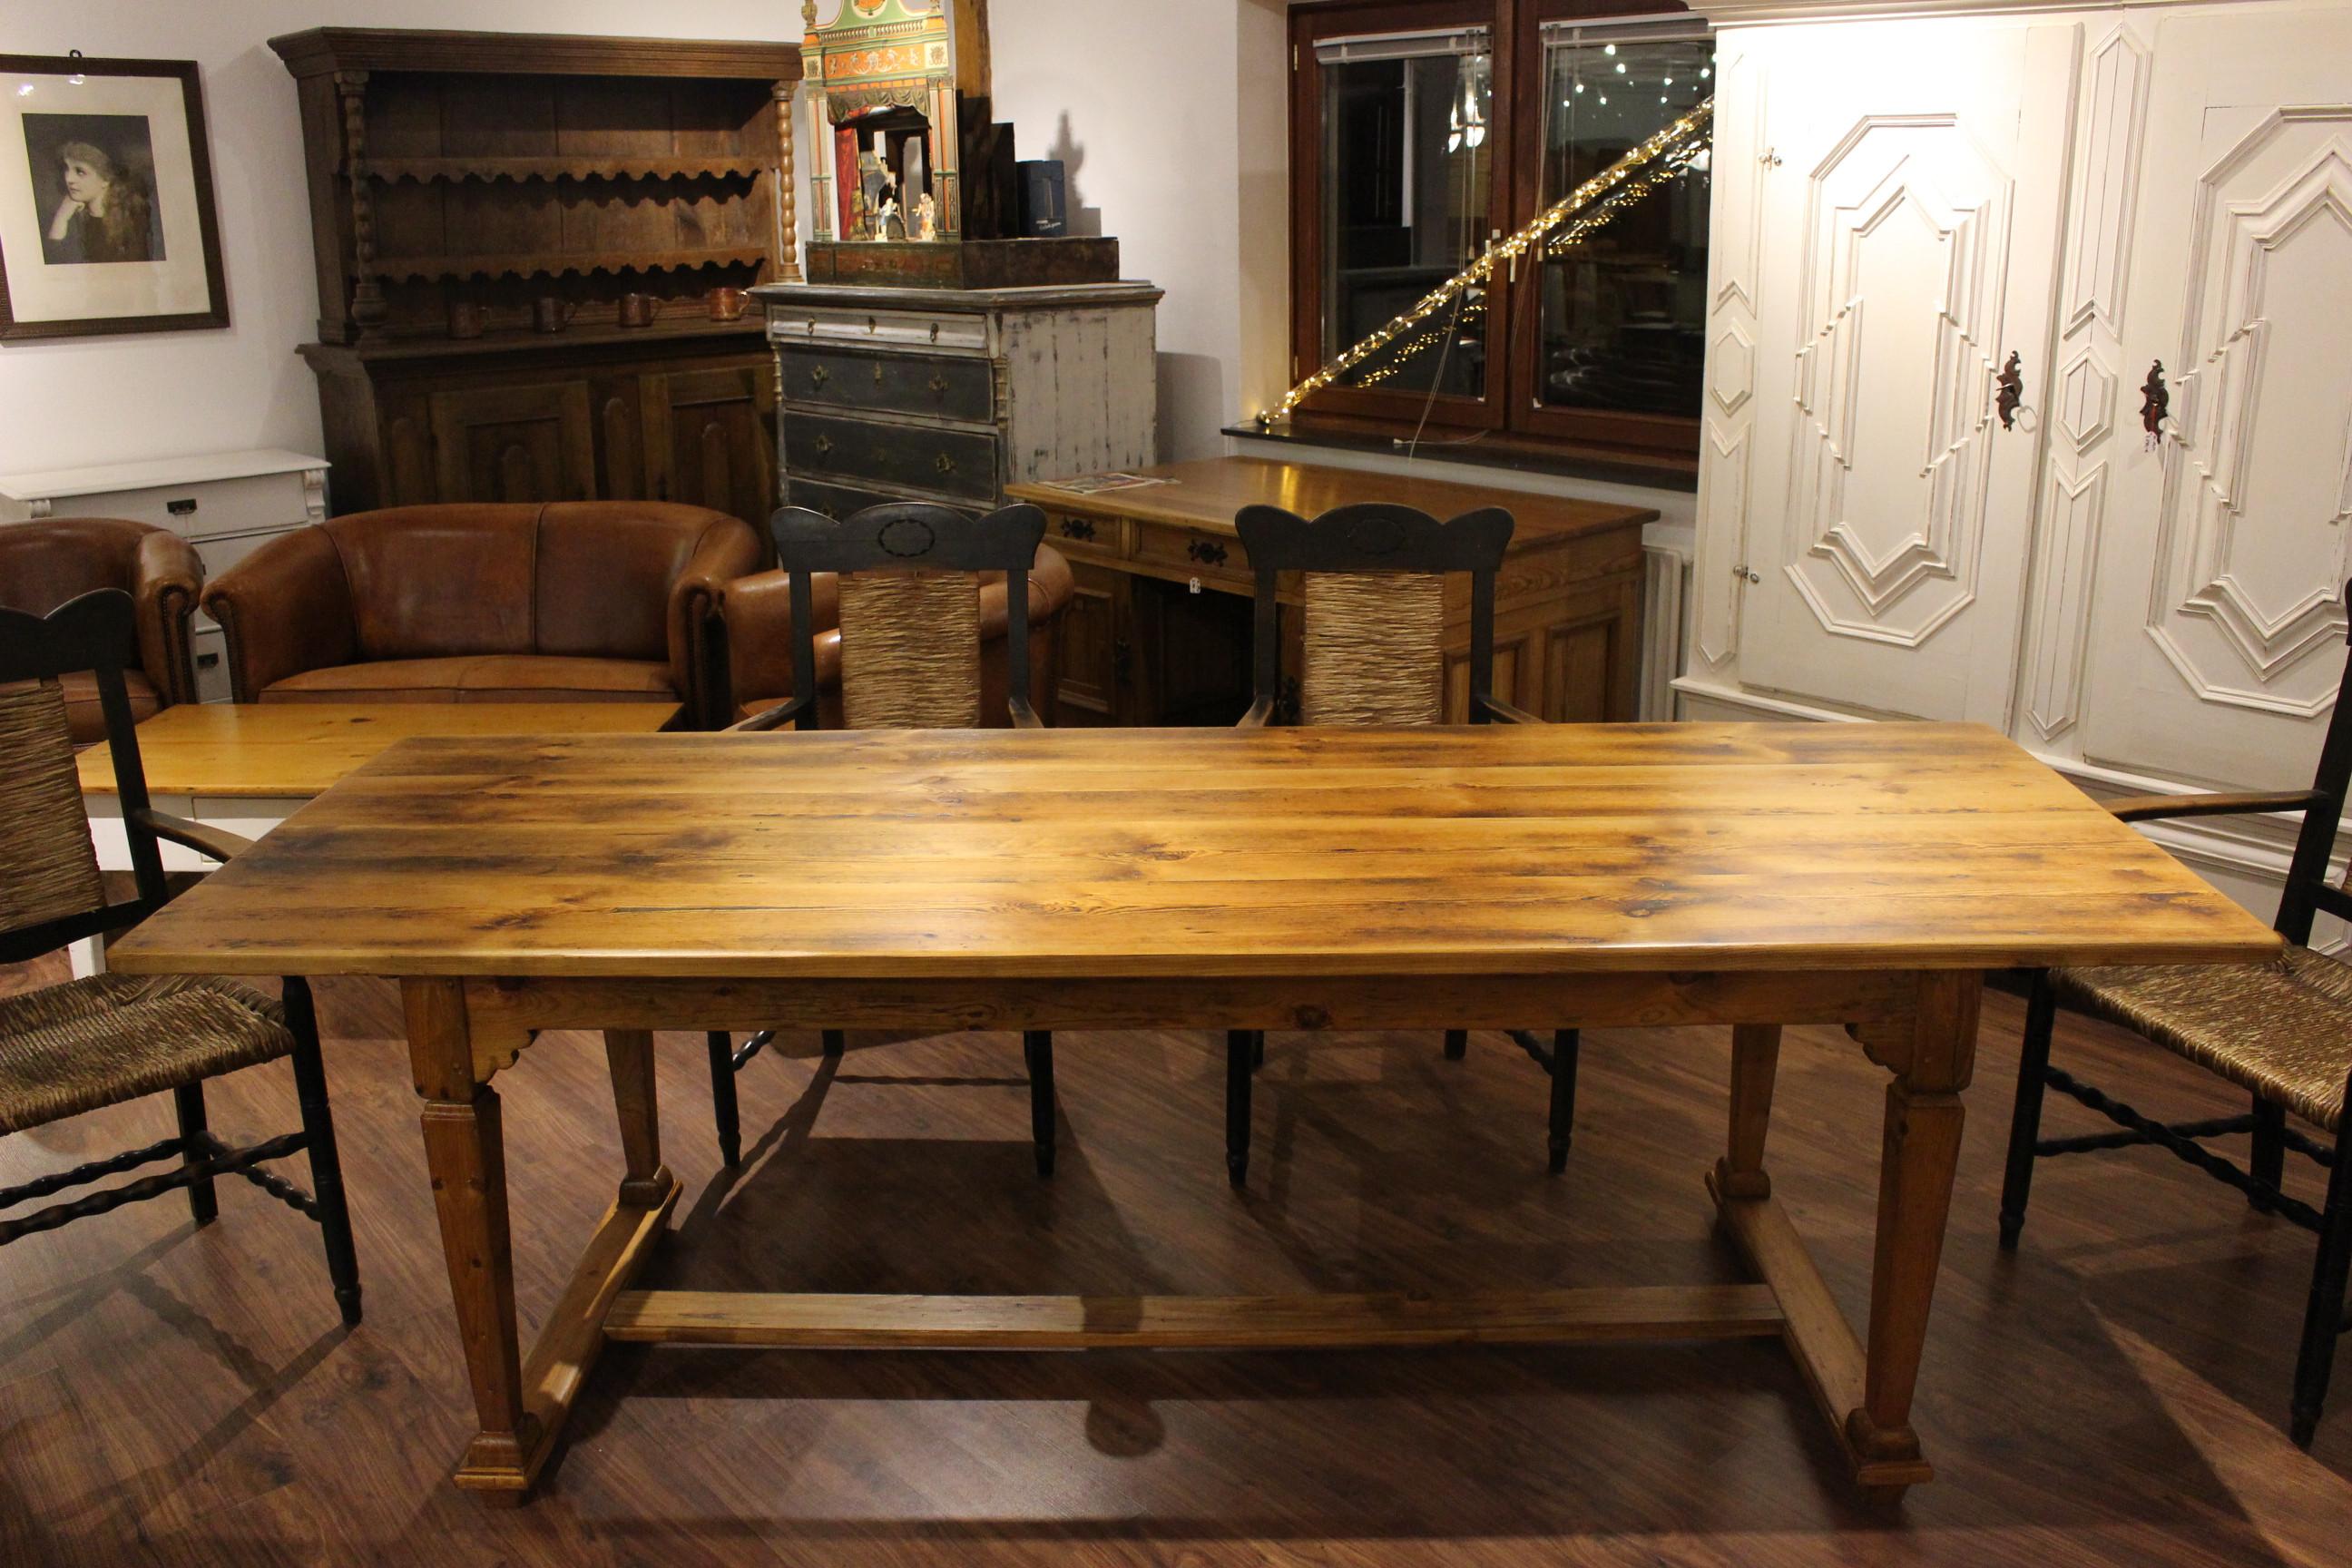 Tisch im Barockstil angefertigt (Art.-Nr.: 03116)